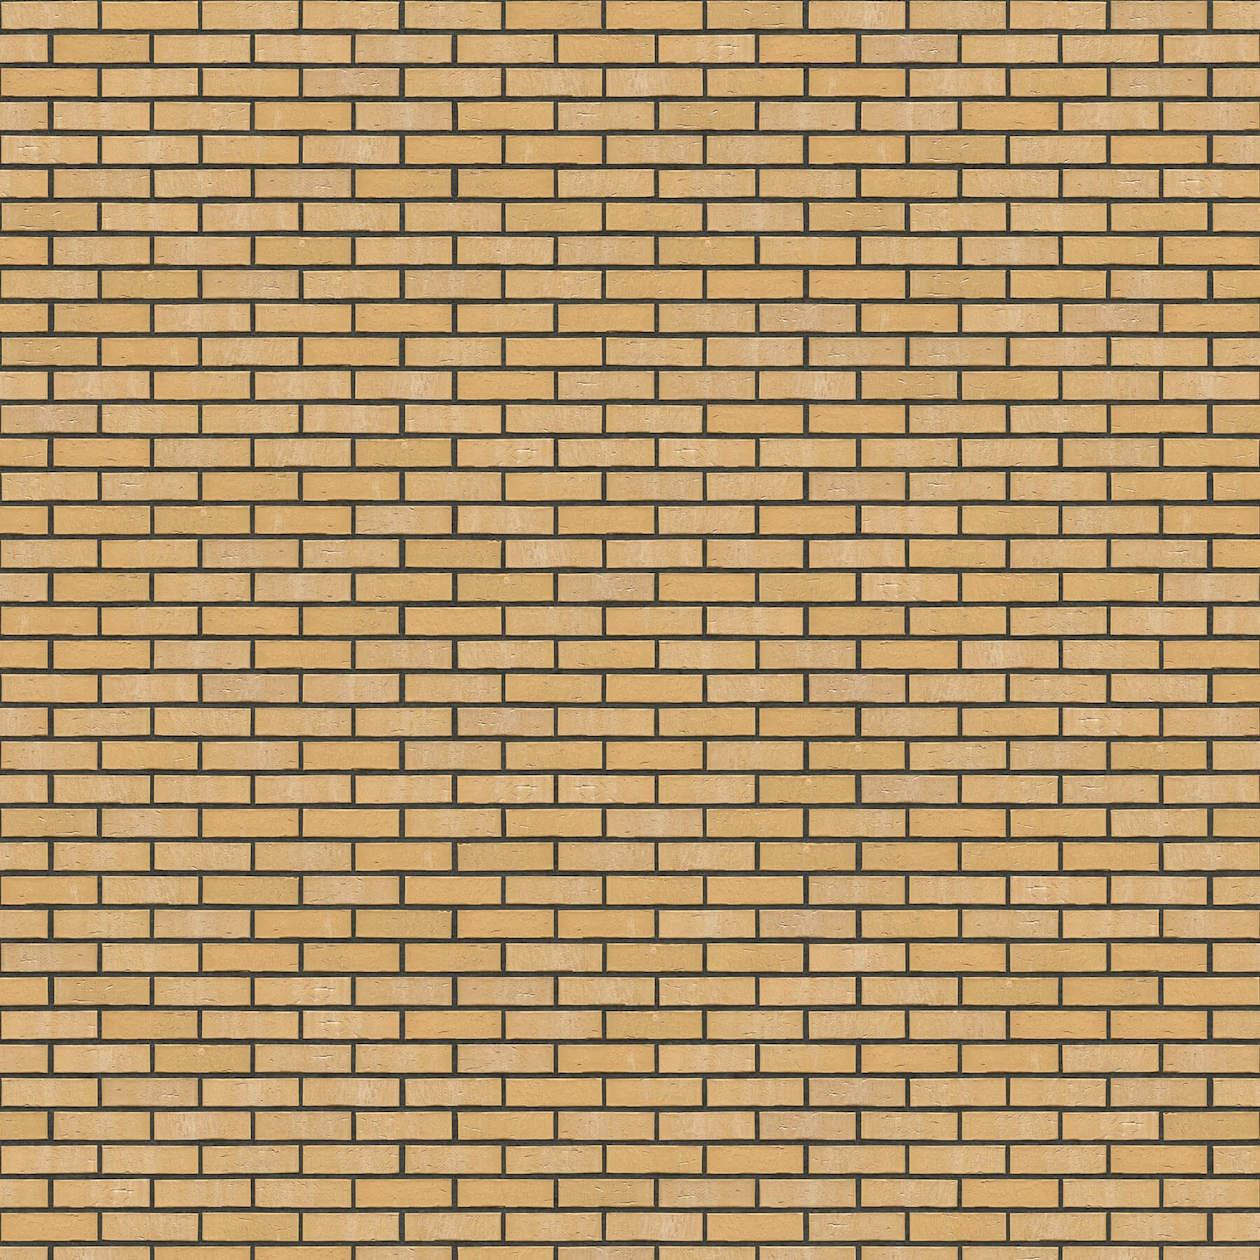 Puna-cigla-FeldHaus-Klinker-brick-house-nf-k-762-Antracit Fuga